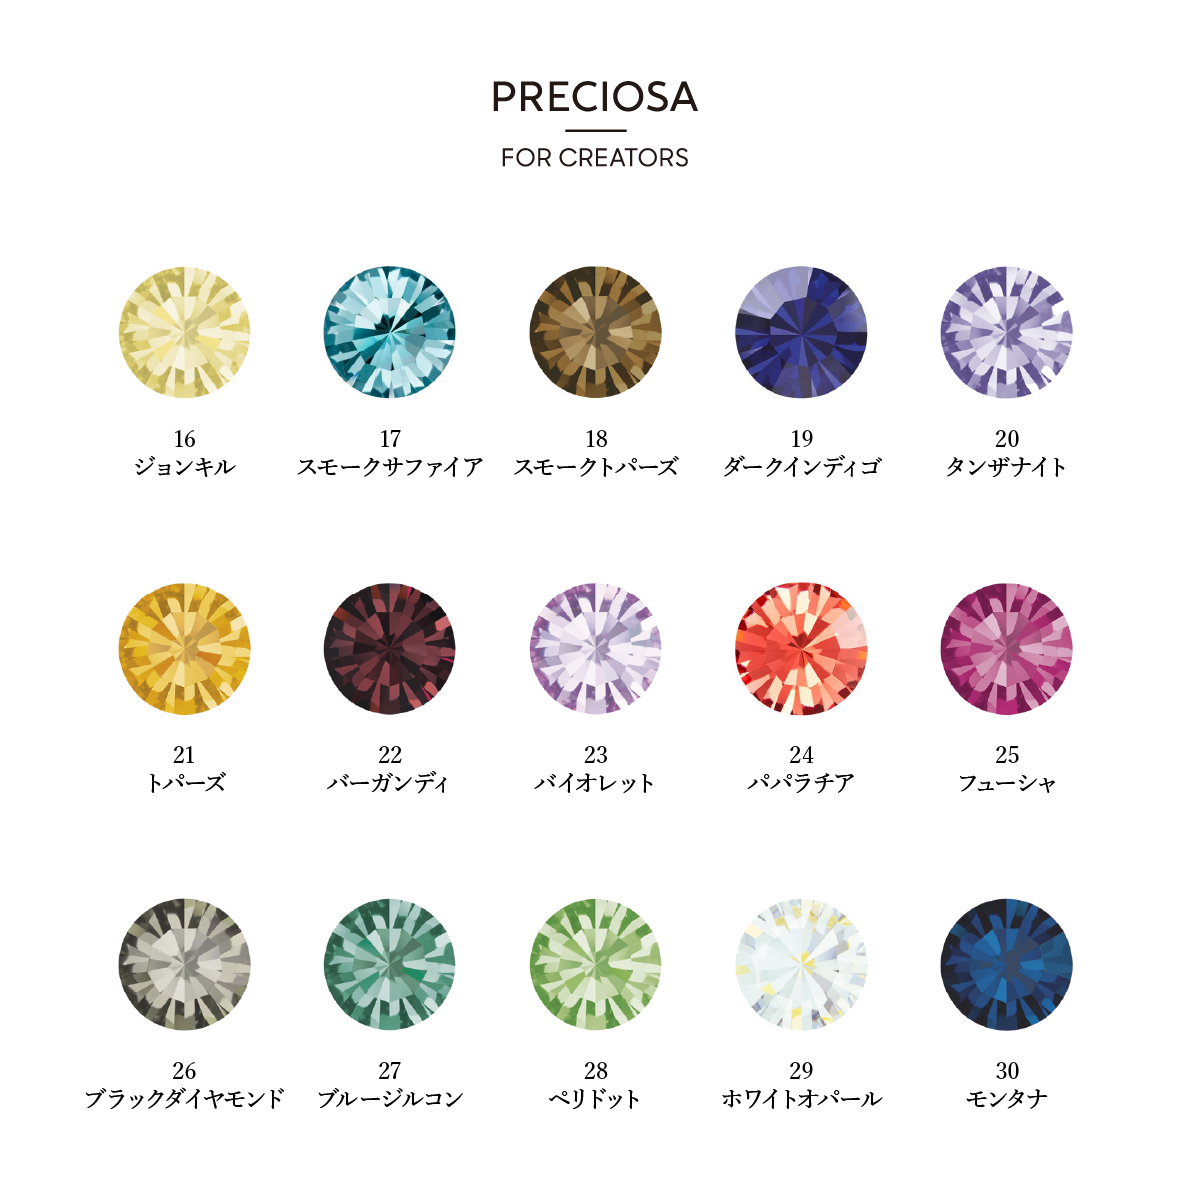 PP24 No.2(シ〜モ) 72粒 プレシオサ PRECIOSA チャトン【グルーデコ®️】